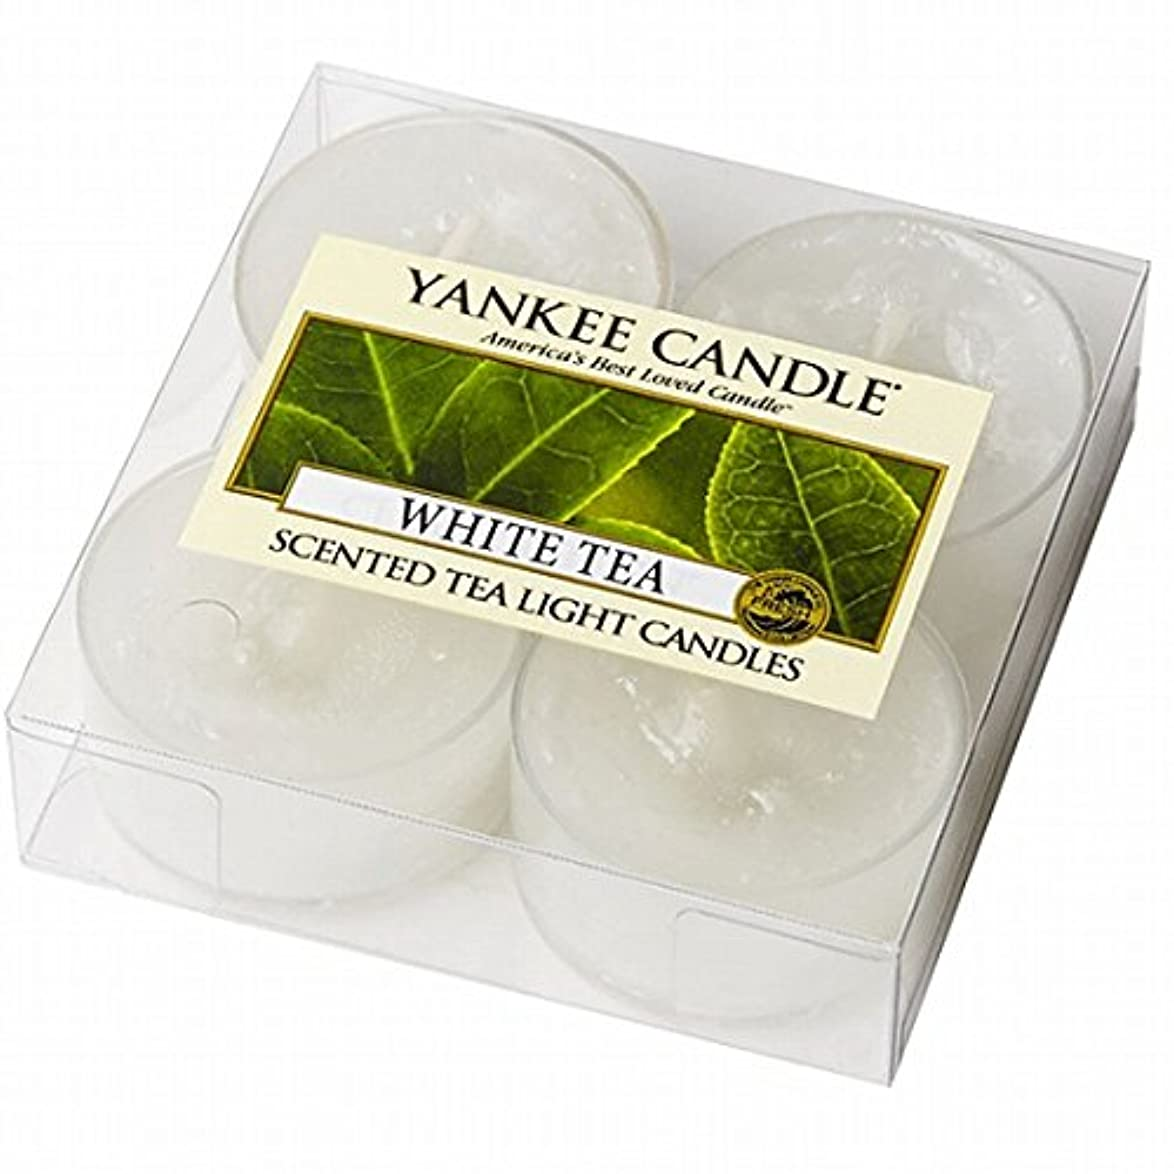 YANKEE CANDLE(ヤンキーキャンドル) YANKEE CANDLE クリアカップティーライト4個入り 「ホワイトティー」(K00205277)